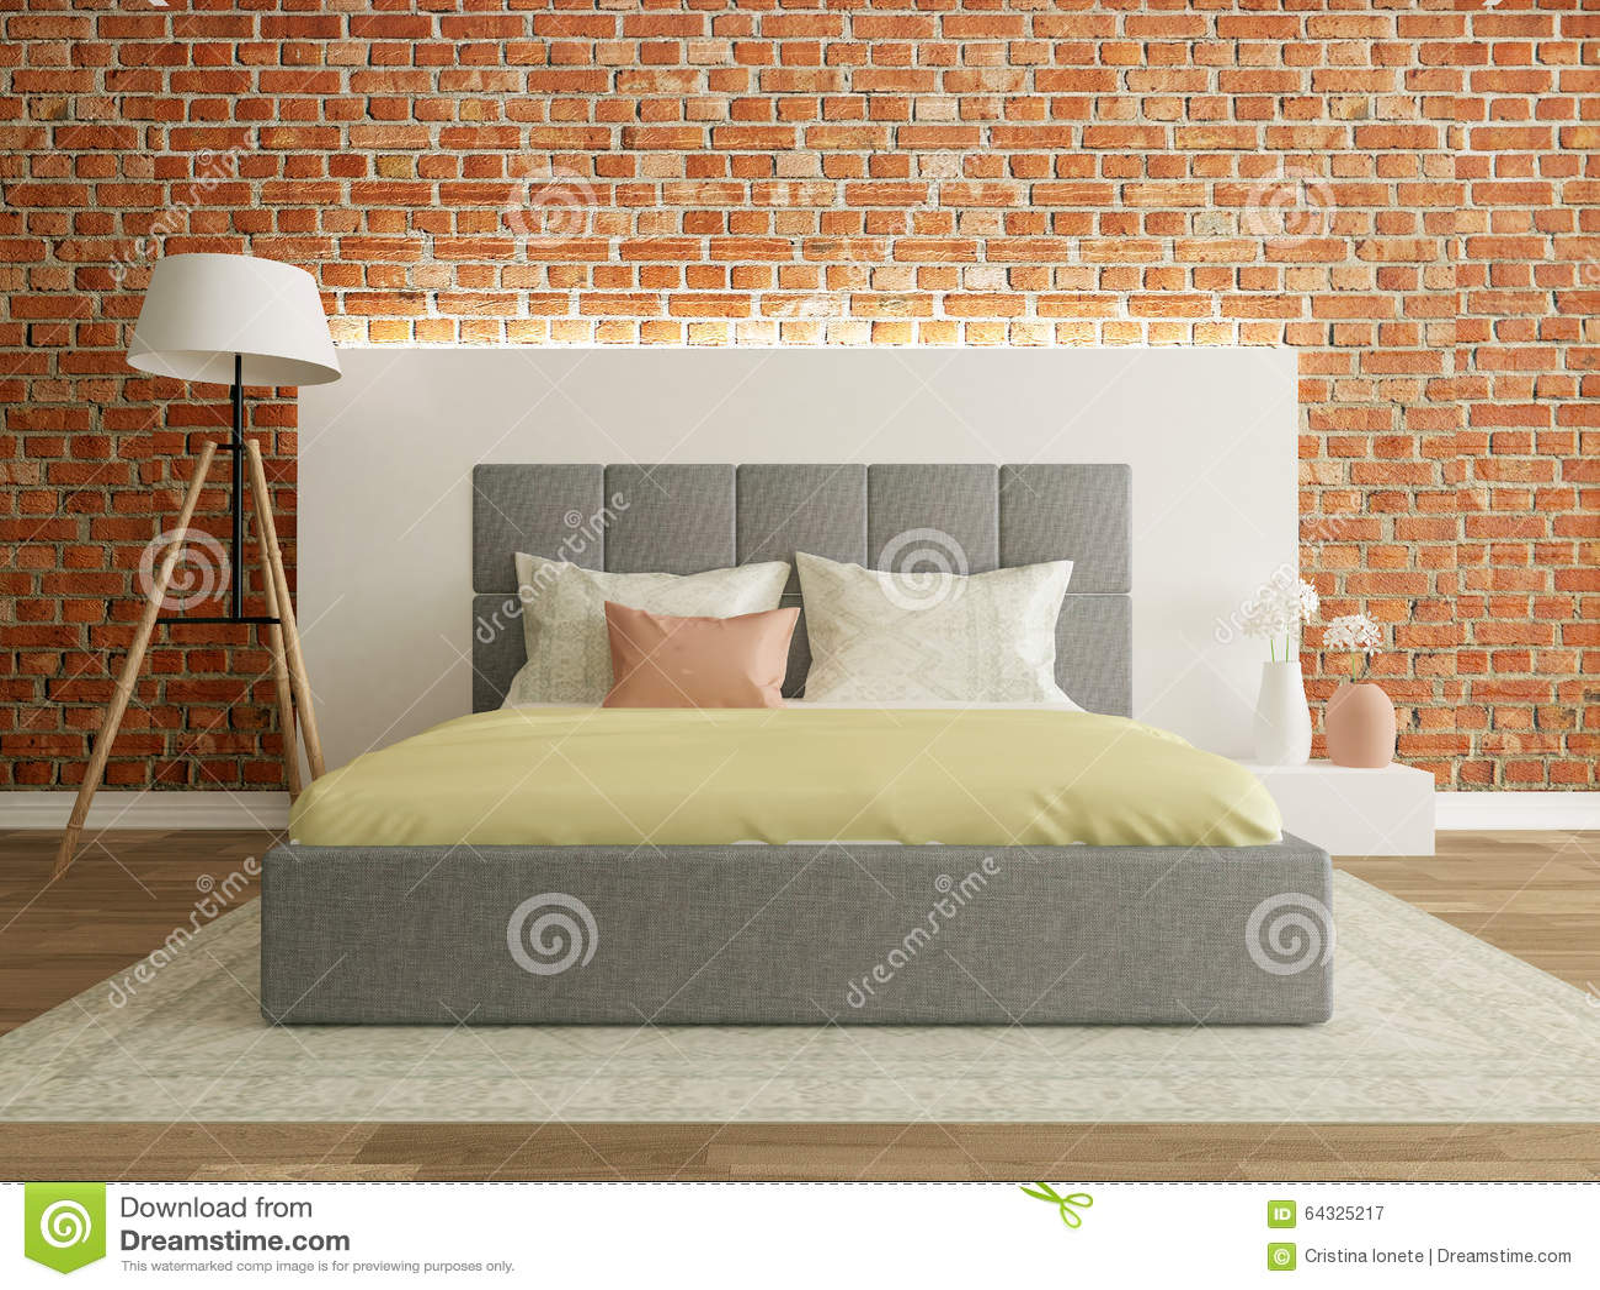 bedroom interior with brick wall, modern room stock illustration